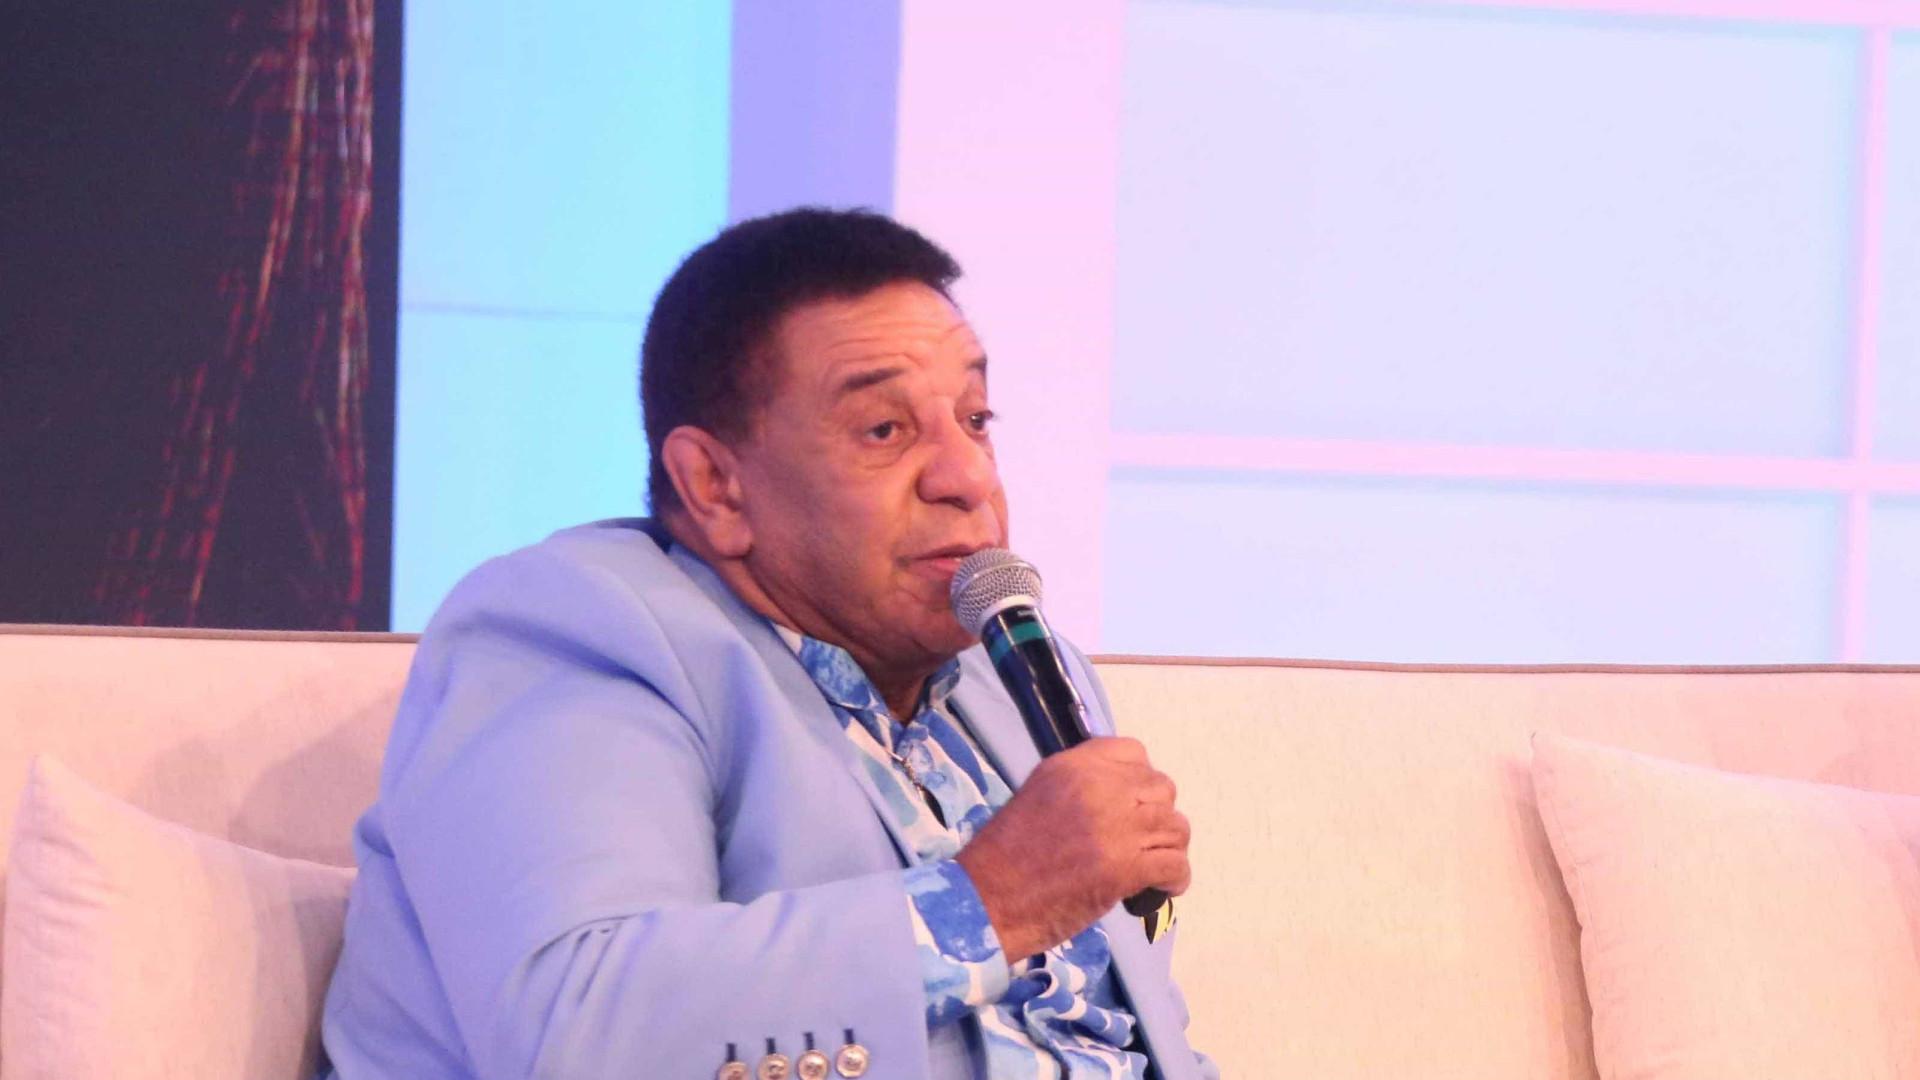 Vereador chama Agnaldo Timóteo de 'macaco gordo' após vídeo polêmico